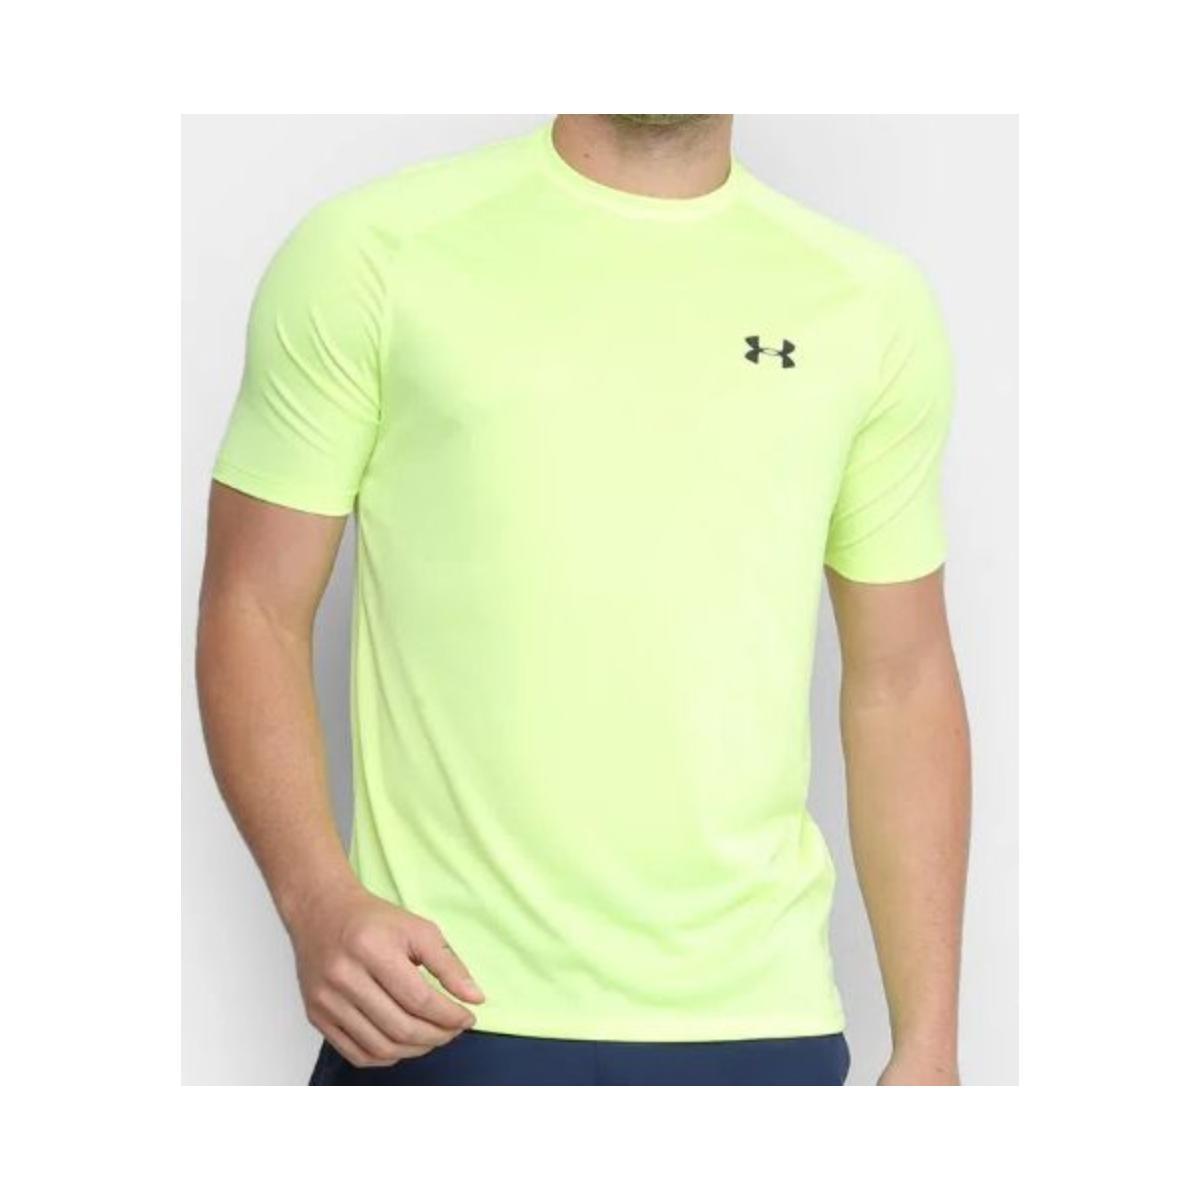 Camiseta Masculina Under Armour 1359378 Tech 2.0 Verde Neon